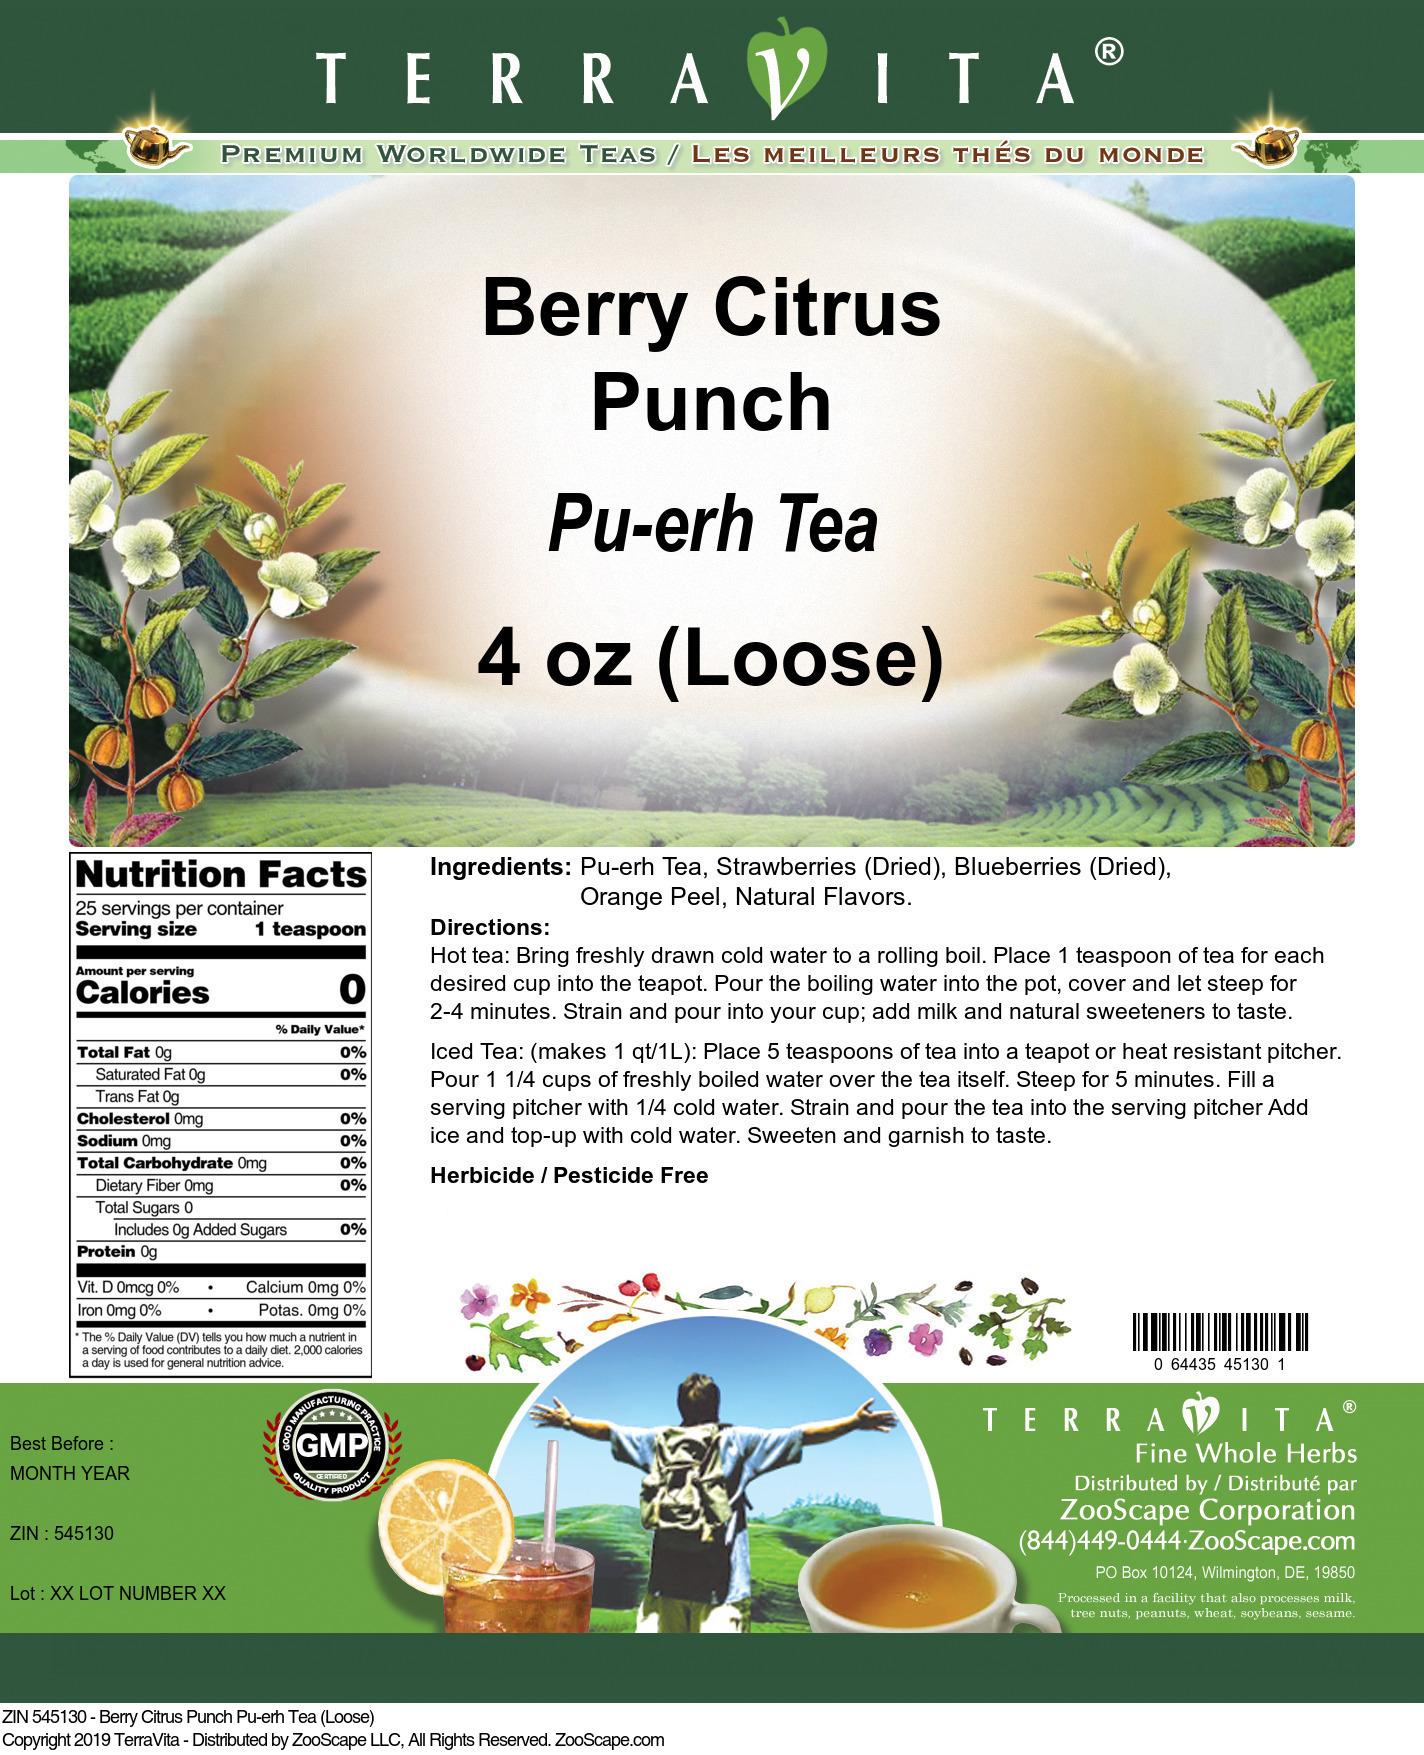 Berry Citrus Punch Pu-erh Tea (Loose)